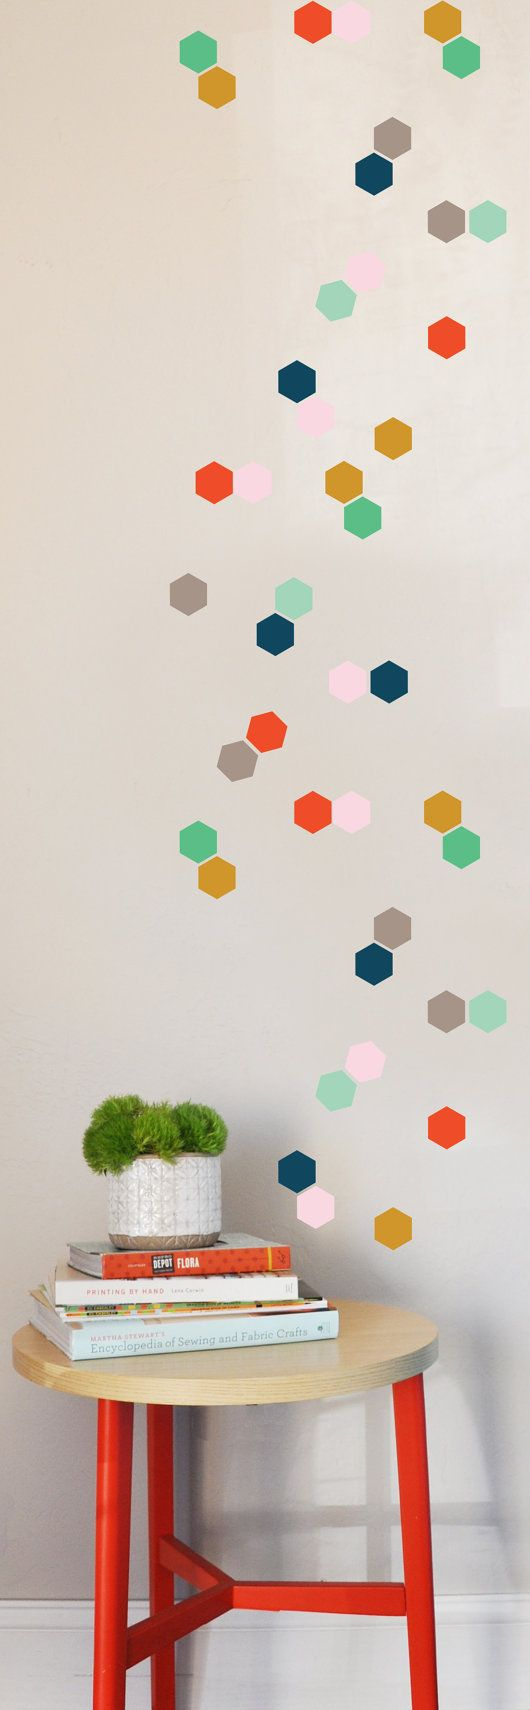 best 25 midcentury wall decals ideas on pinterest midcentury tiny honey comb wall decal van thelovelywall op etsy